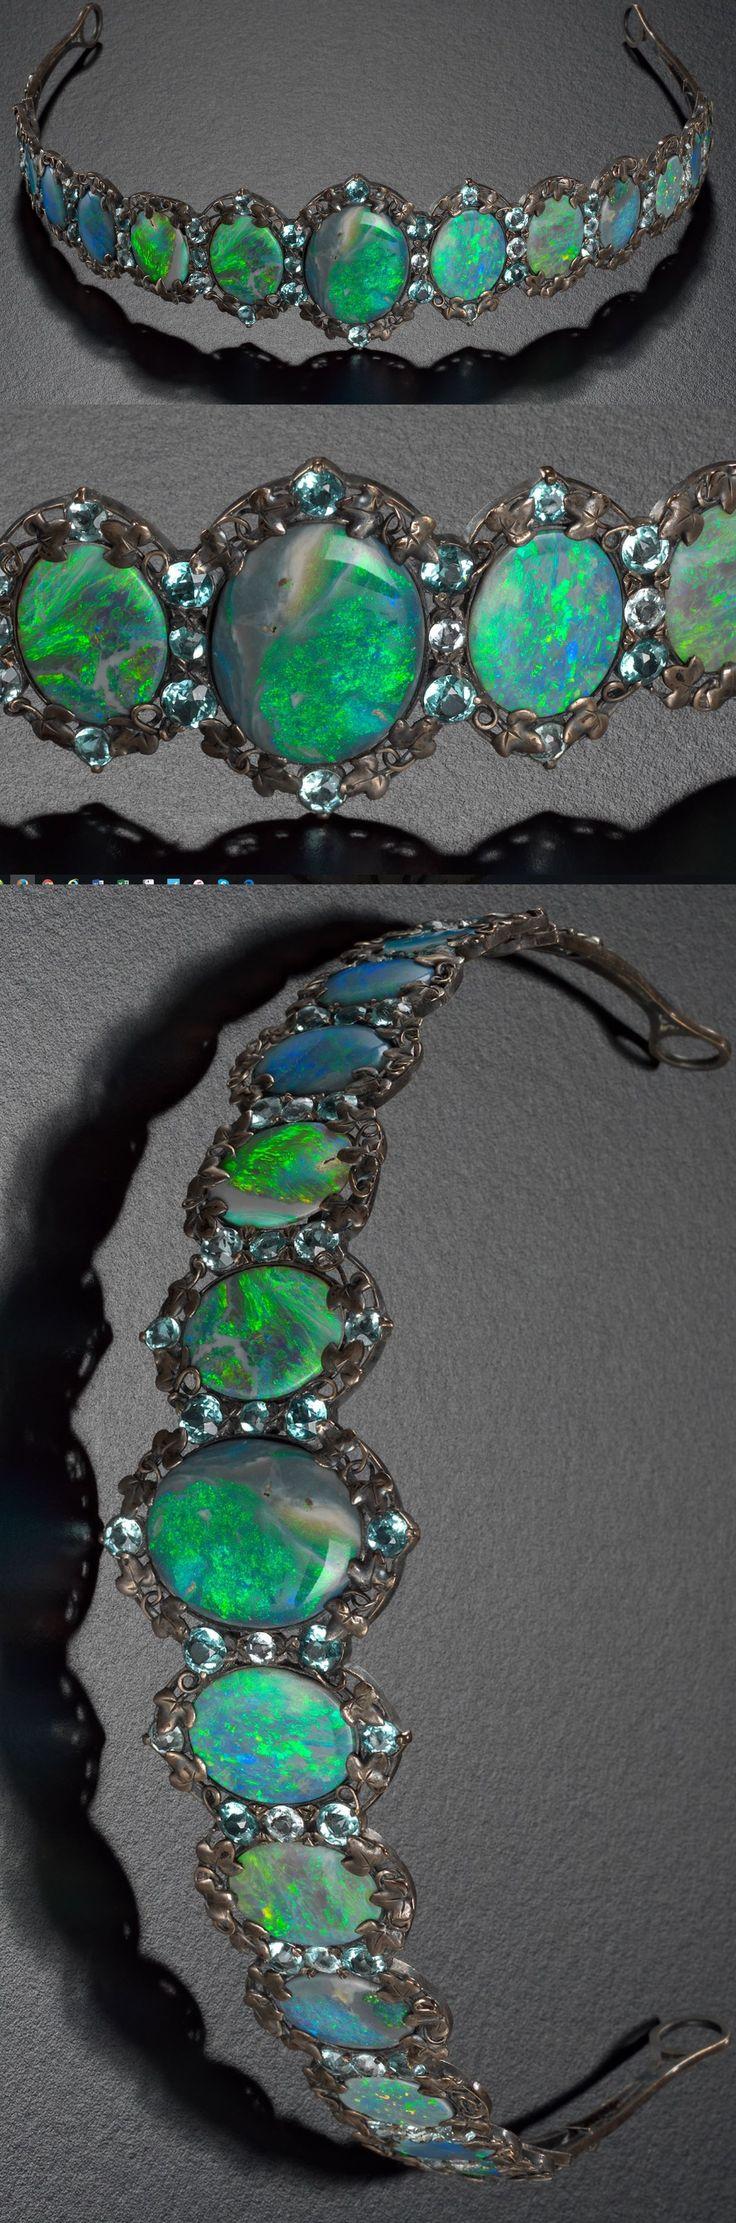 Tiara c1925. Silver, opals and Aquamarines. National Gallery, Victoria, Australia #opalsaustralia